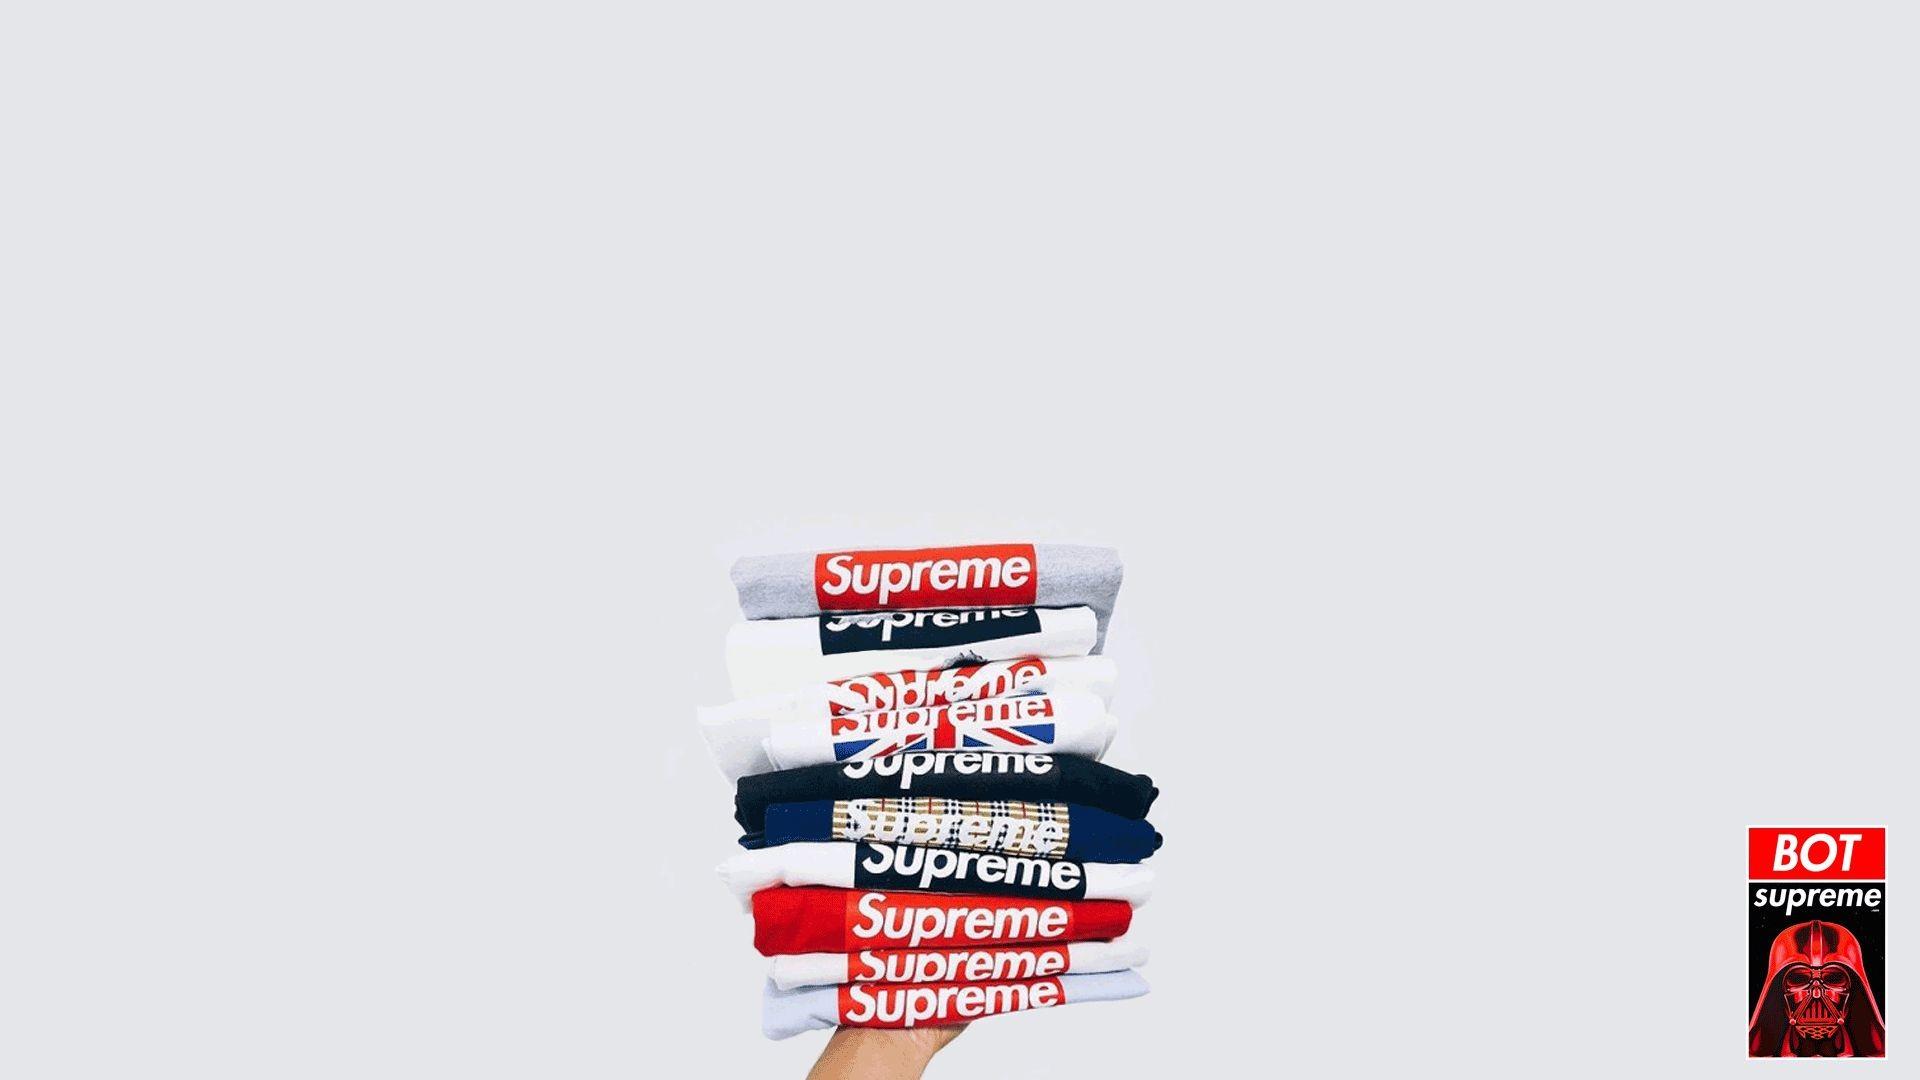 83 Supreme Wallpapers on WallpaperPlay 1920x1080